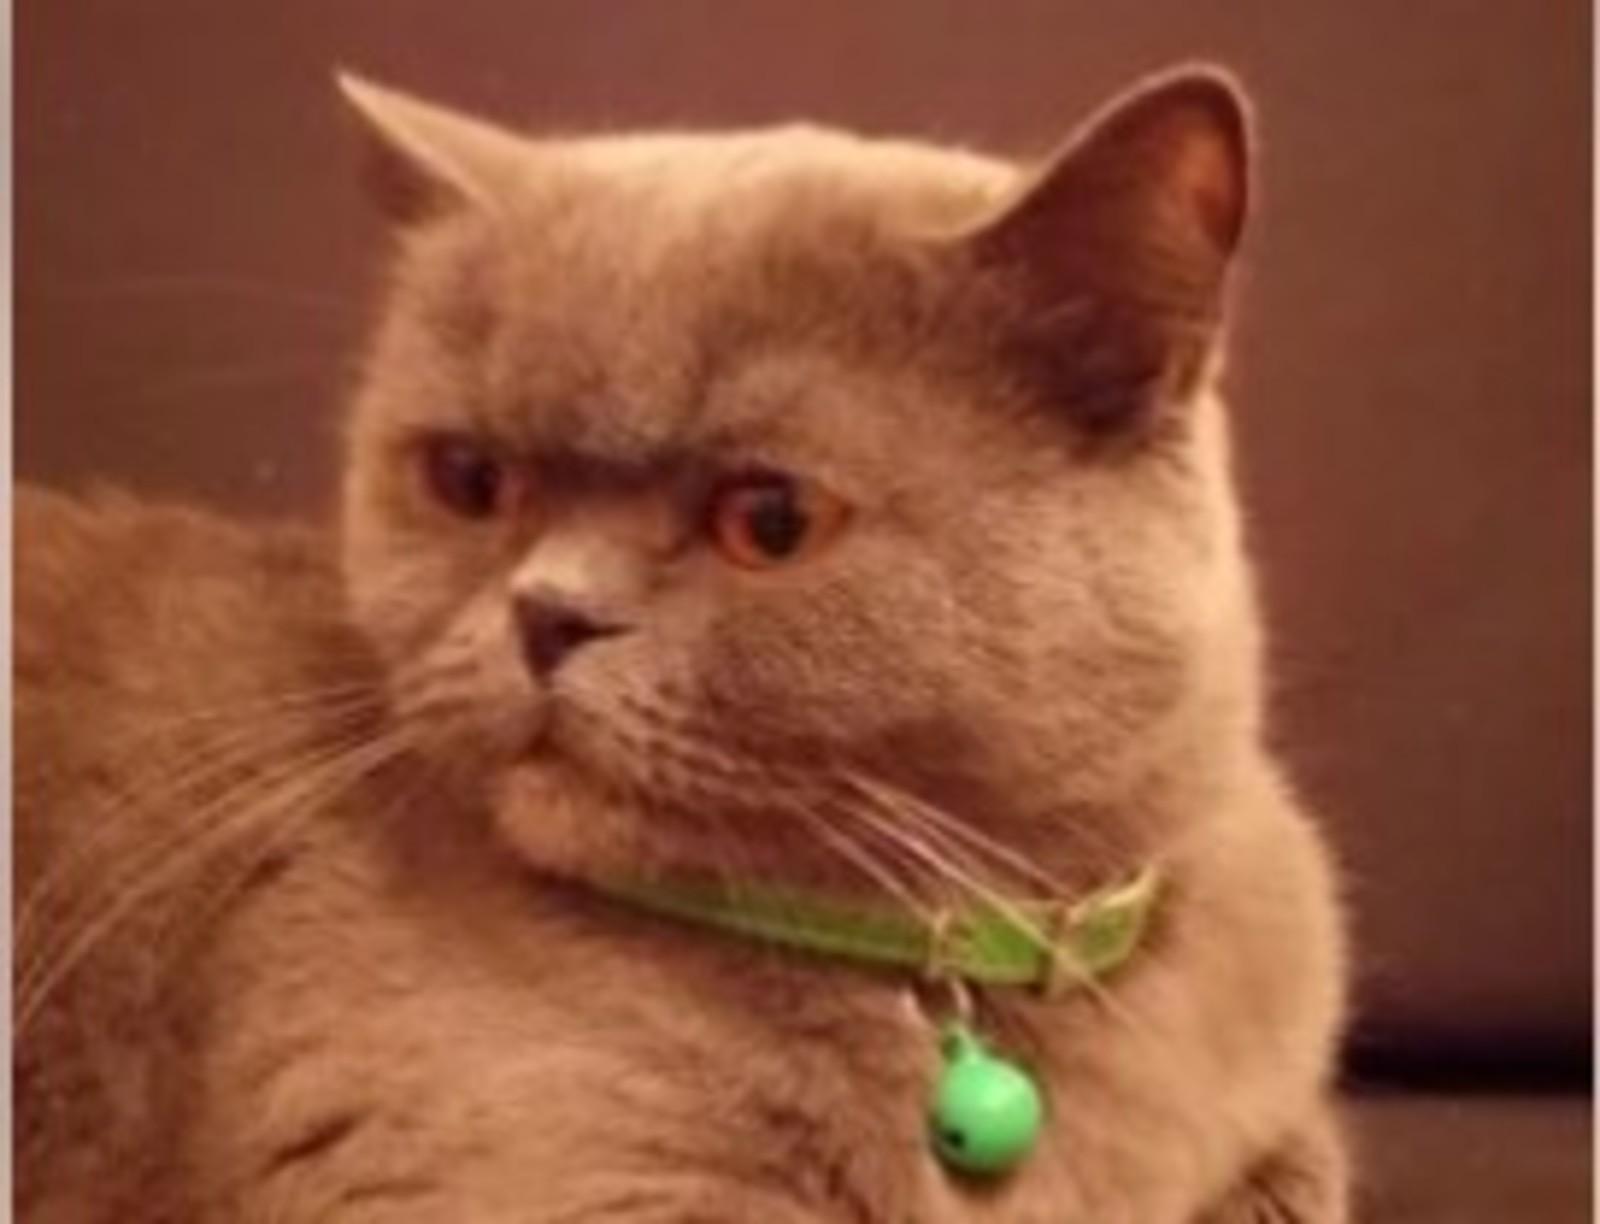 Гресси любит сладкое, а также «отгоняет соседок от мужа, лечит от похмелья» / Фотография с сайта «Авито» (https://www.avito.ru/rostov-na-donu)